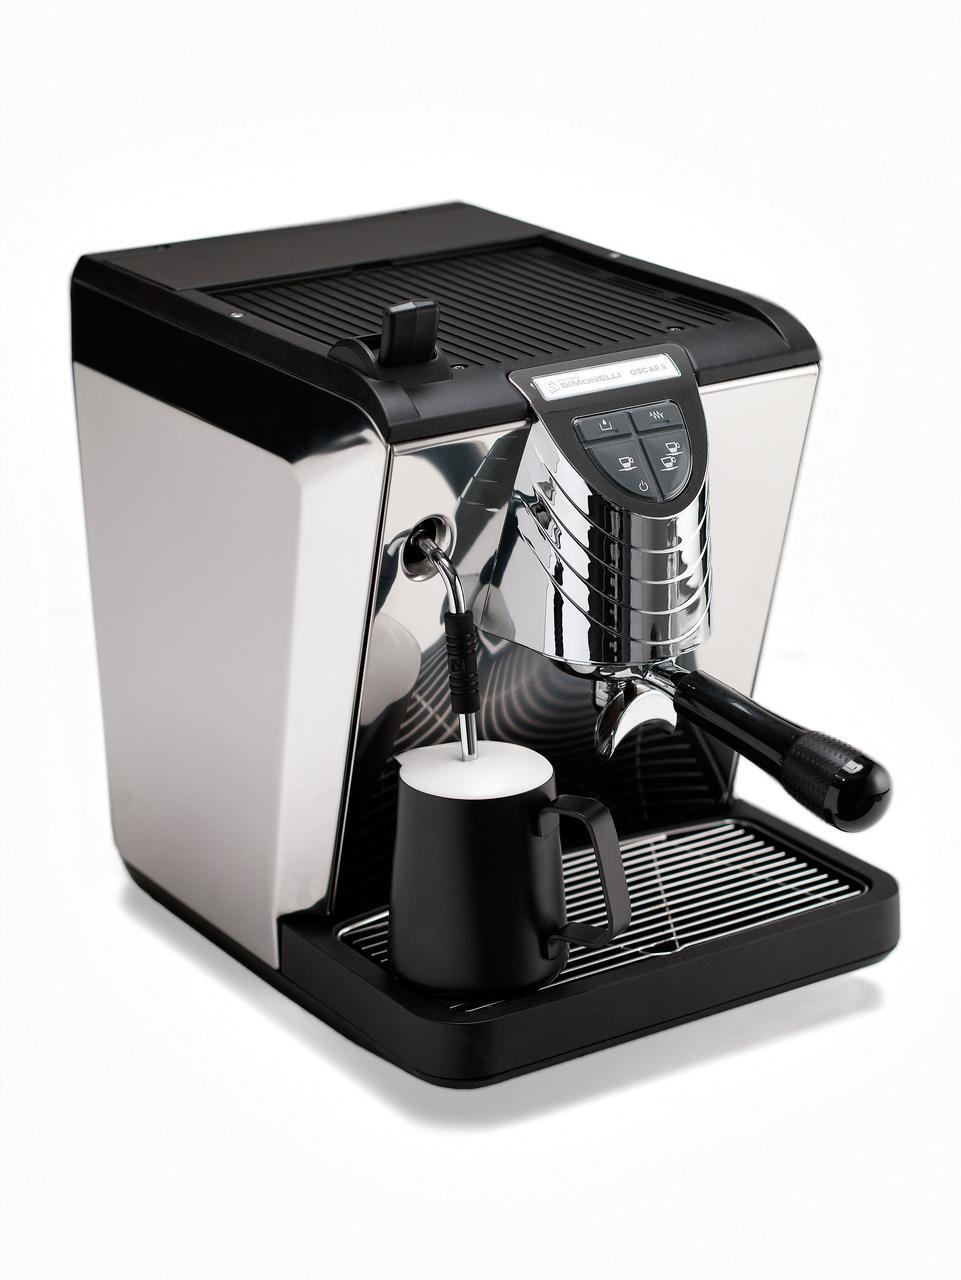 Кофемашина Nuova Simonelli - Oscar II черная